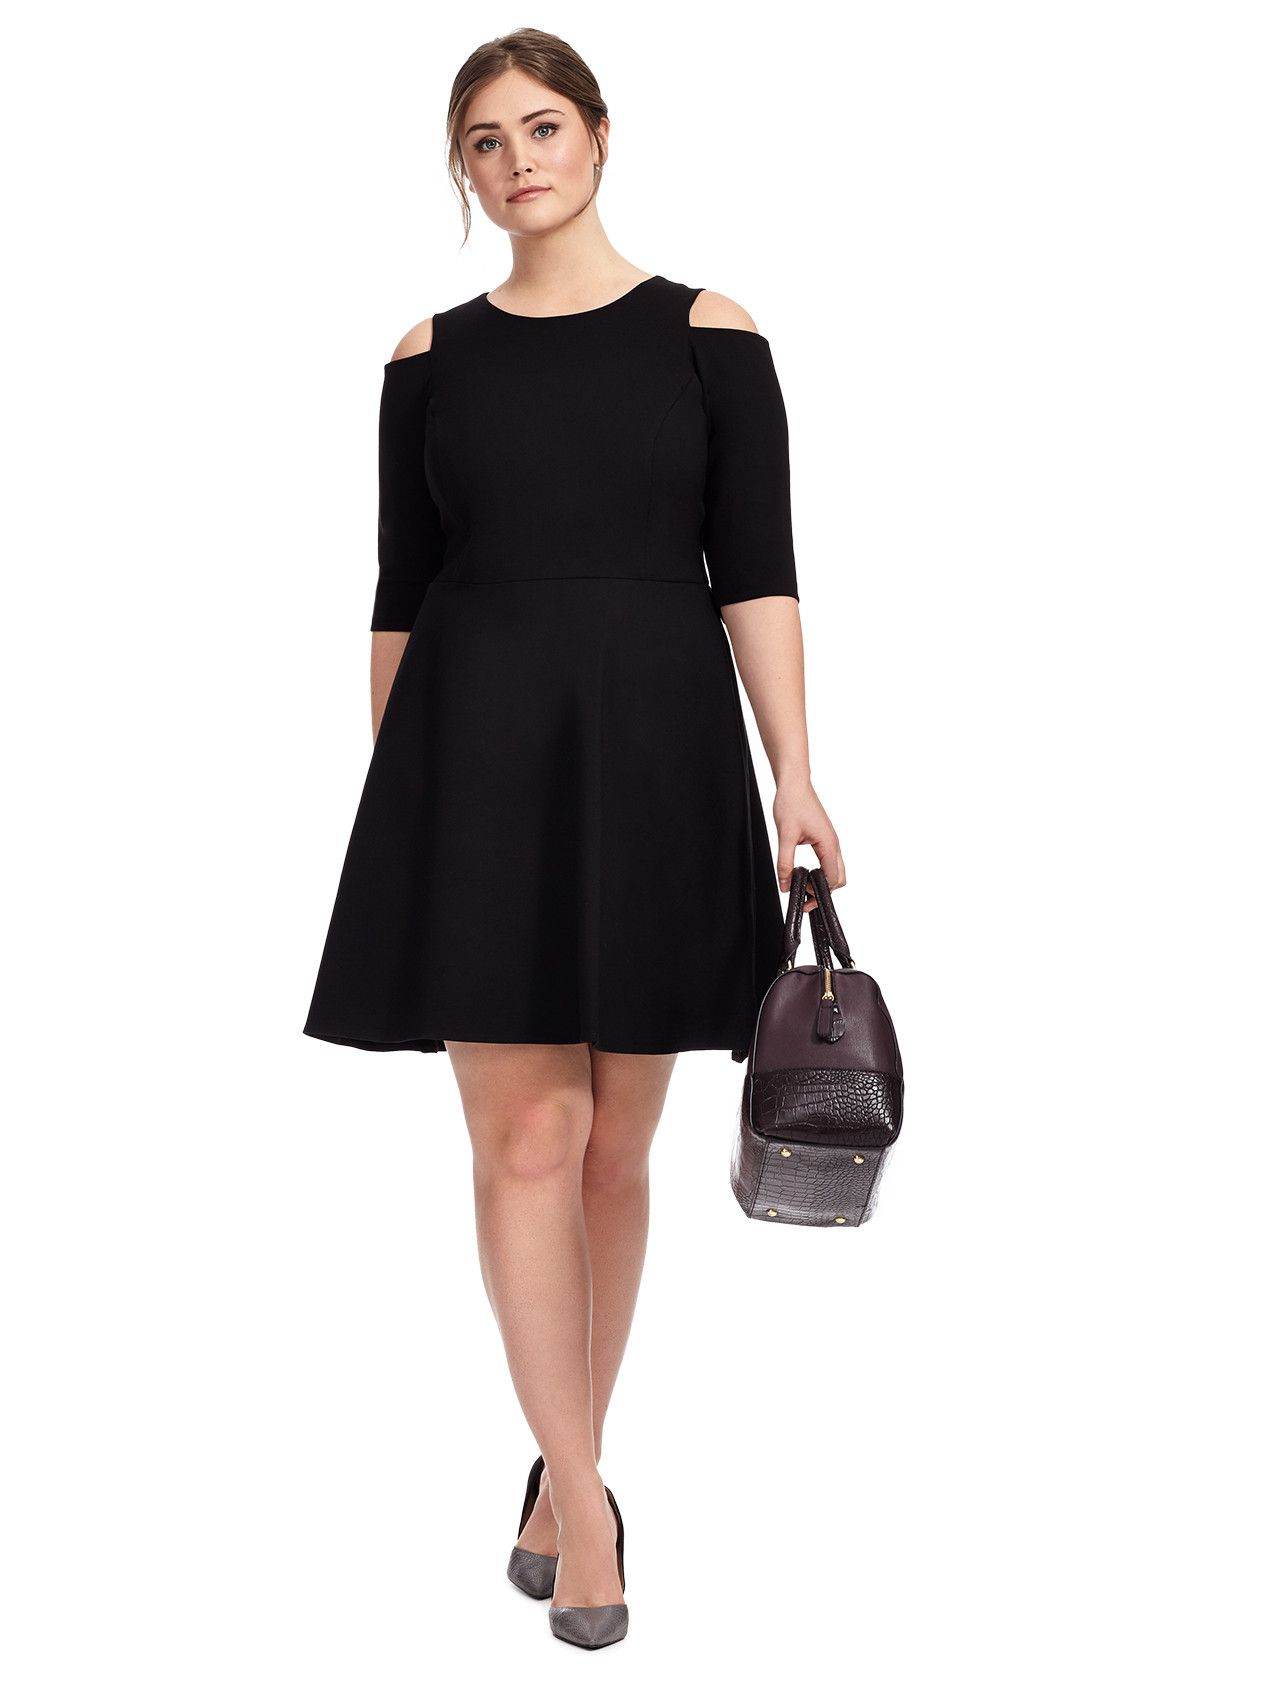 Cold shoulder fit flare dress in black stylish plus